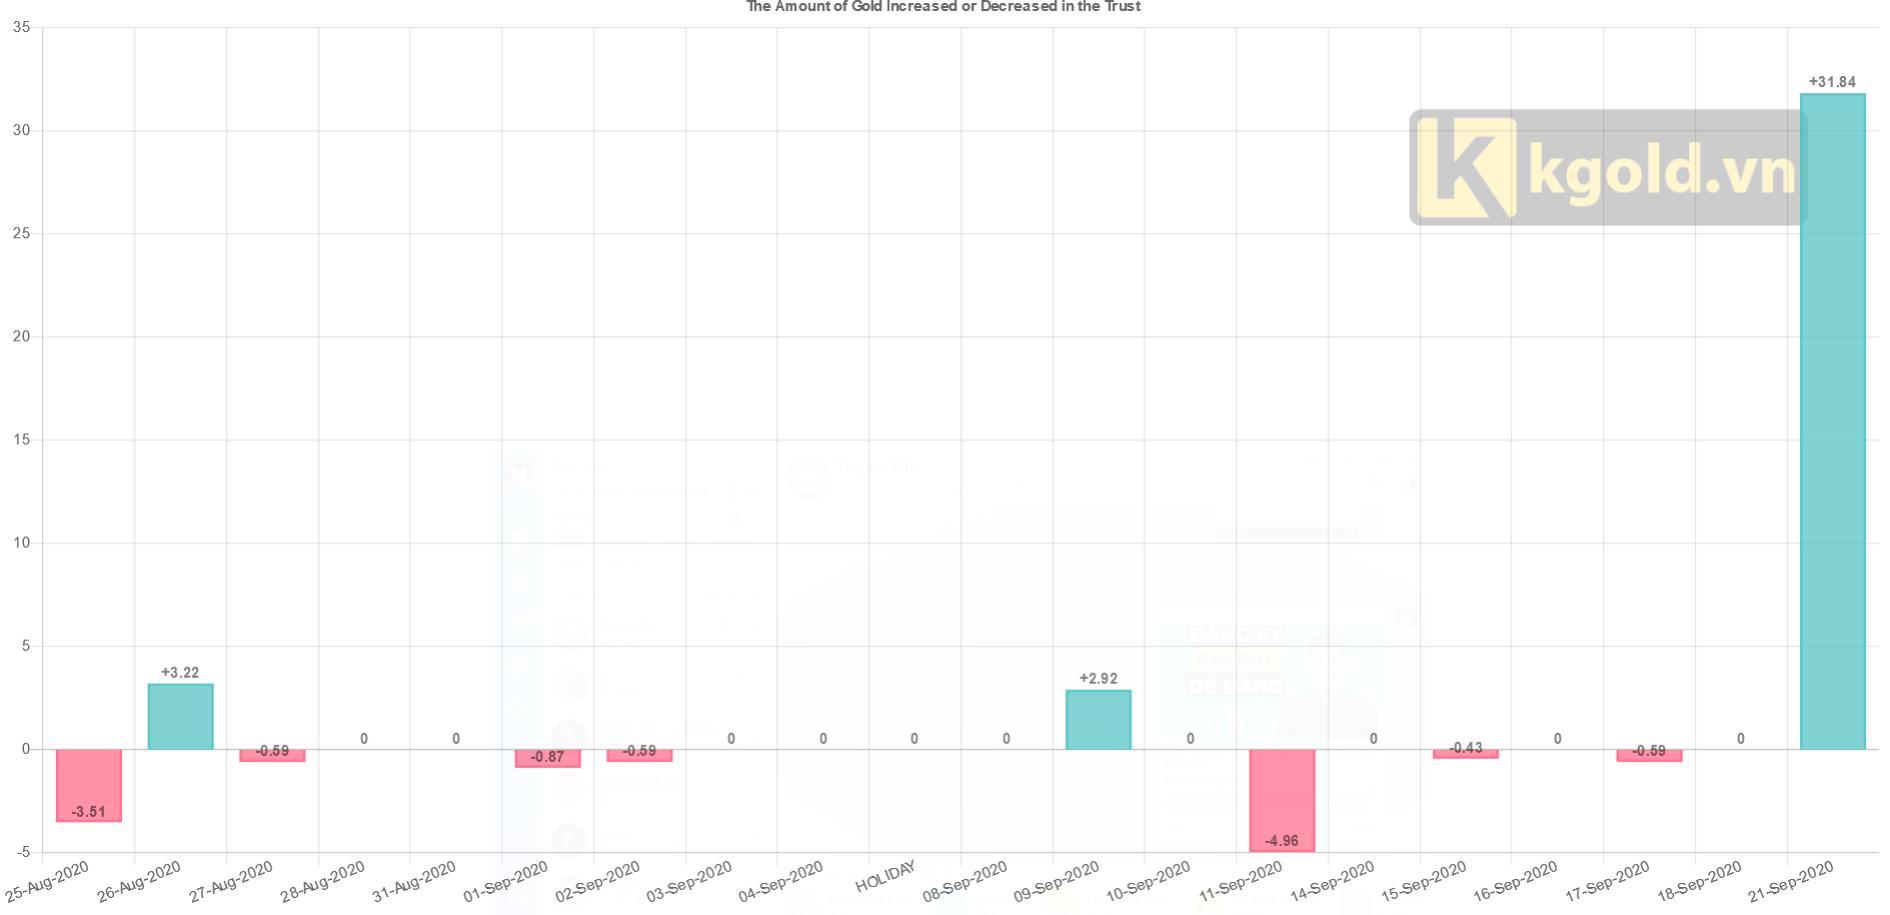 Biểu đồ mua bán quỹ SPDR